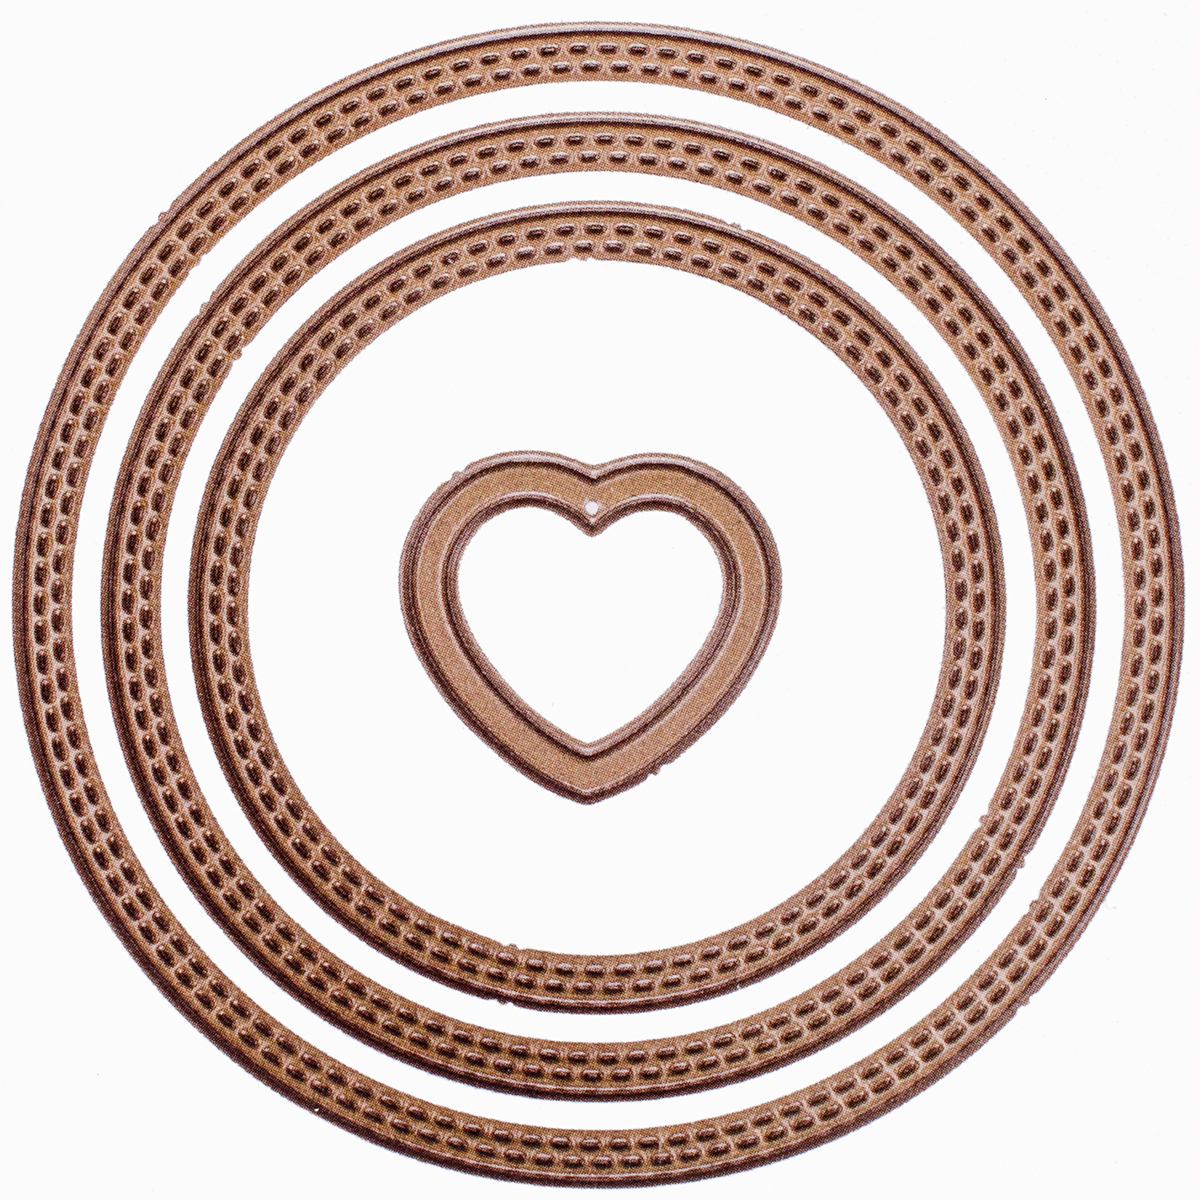 Gina K Designs 3 Nested Circle Dies-Small